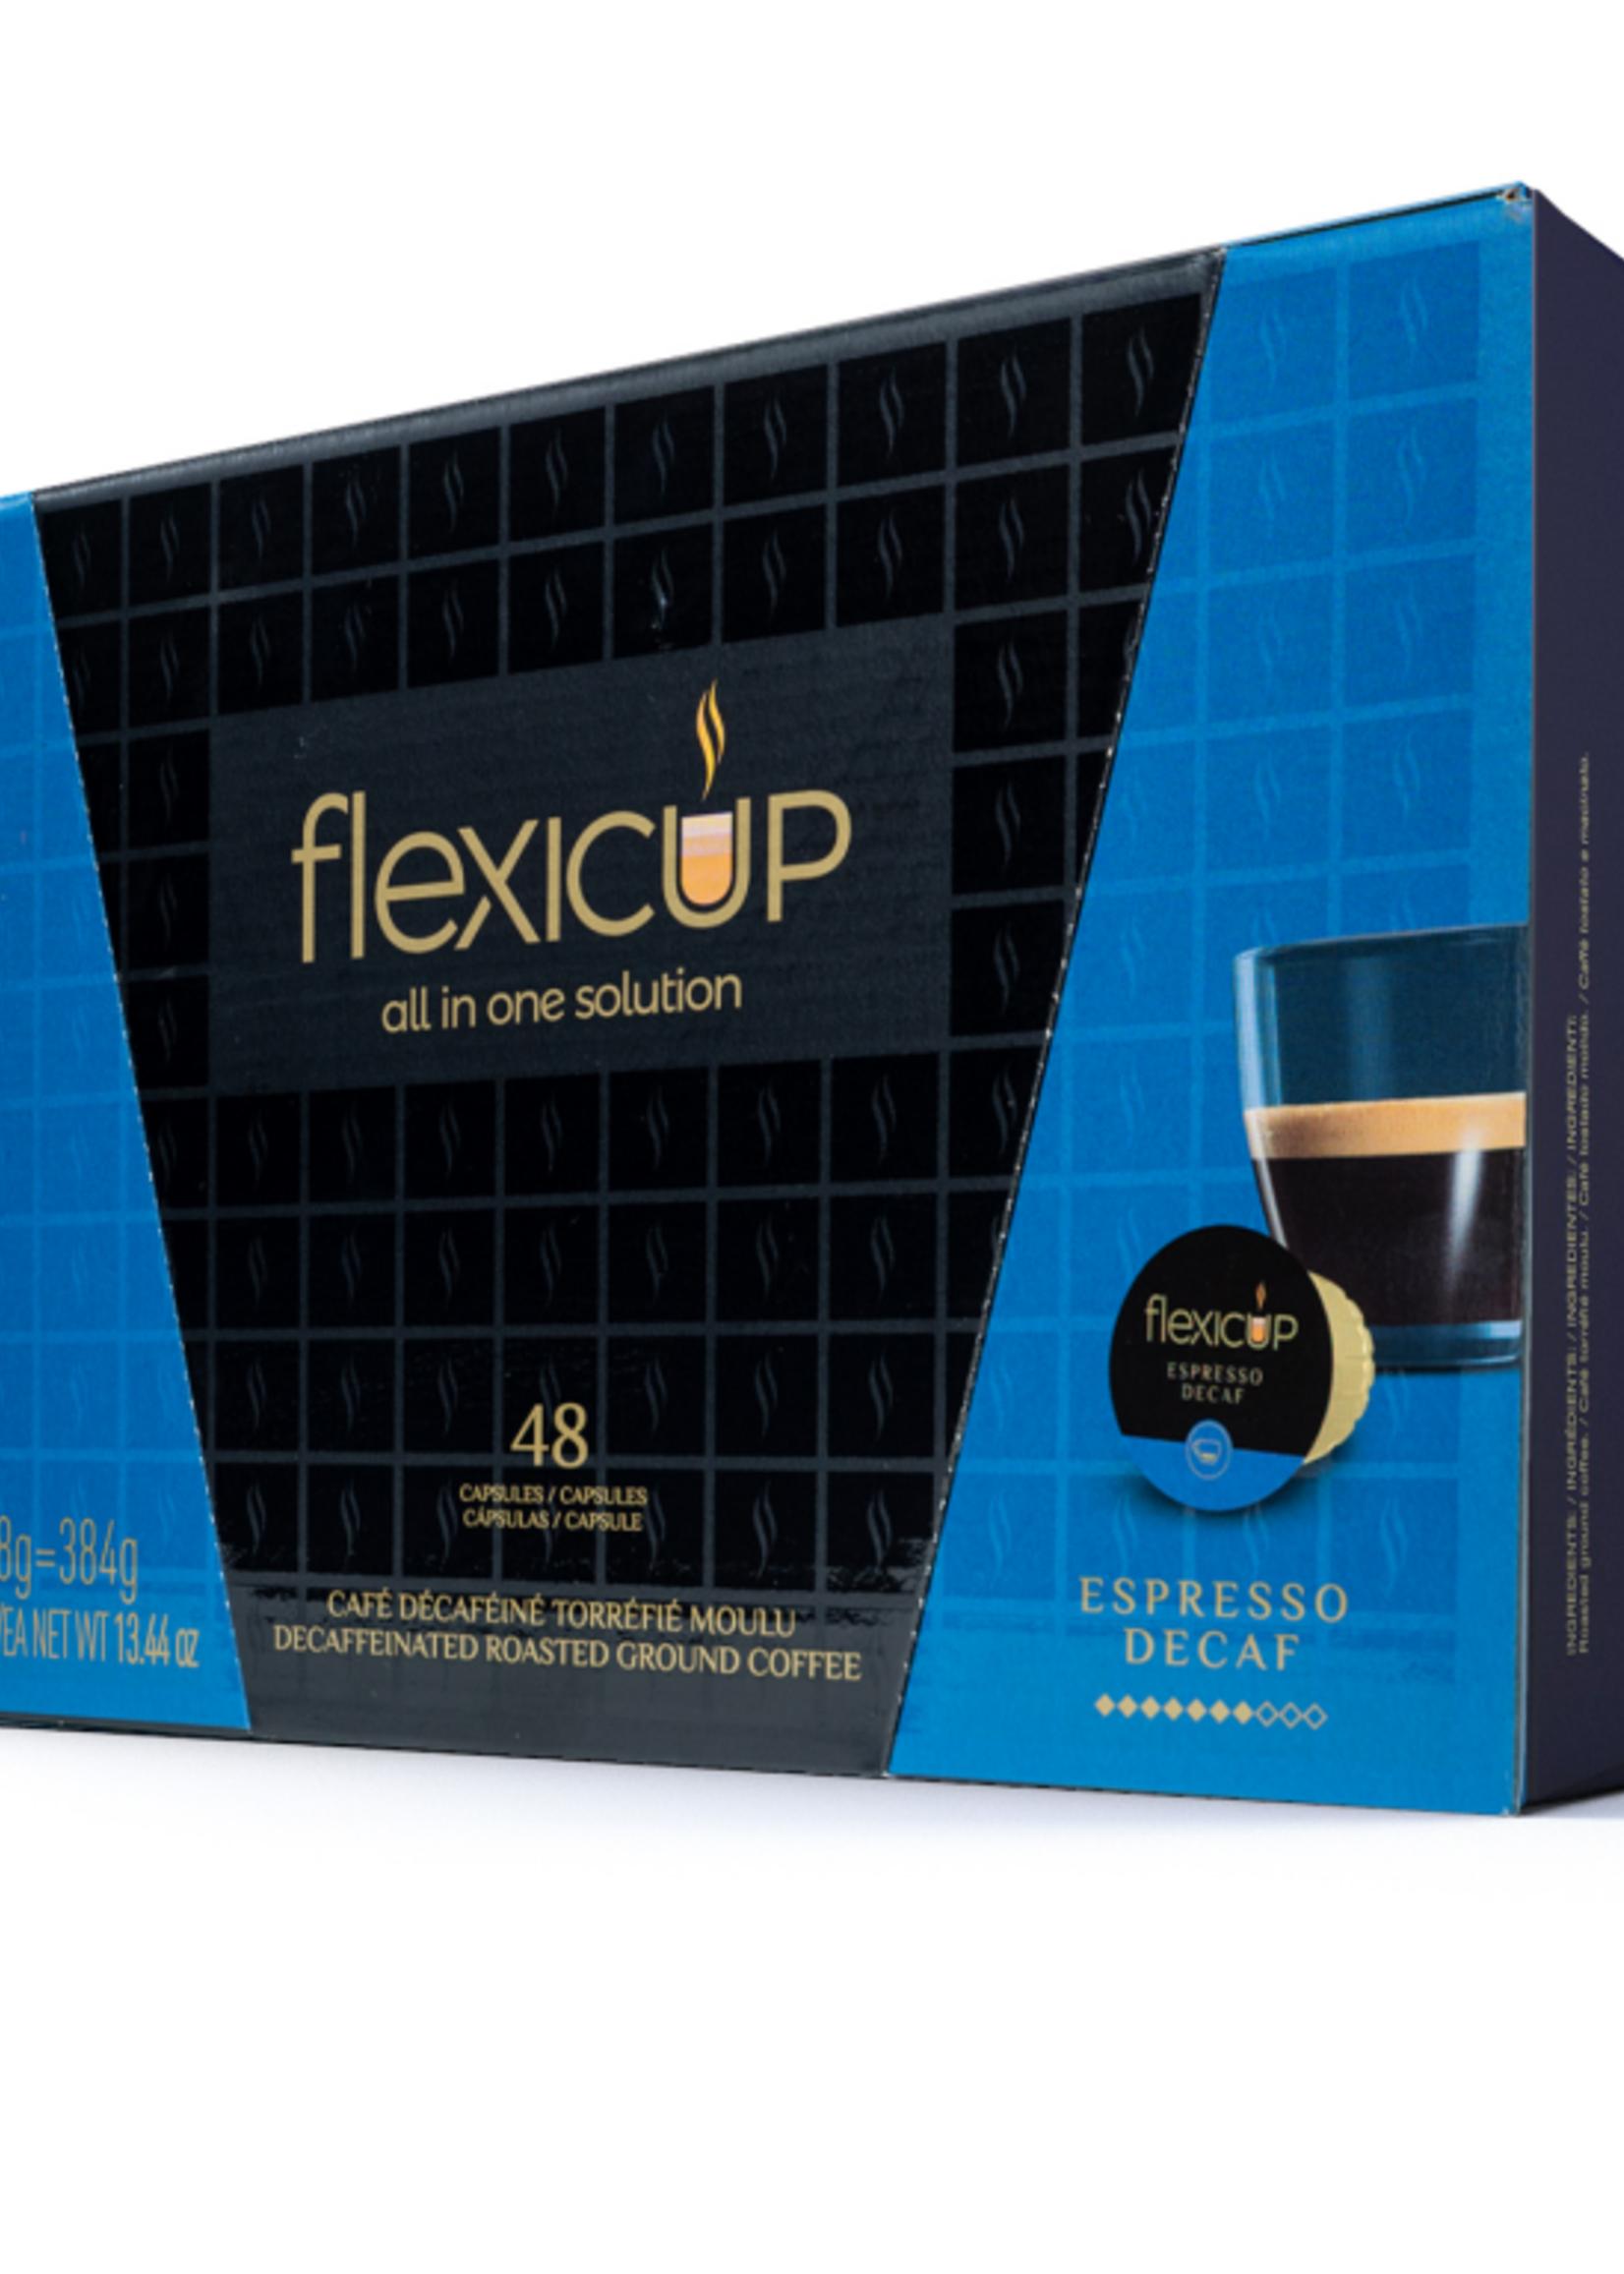 flexicup flexicup Espresso Decaf (48)